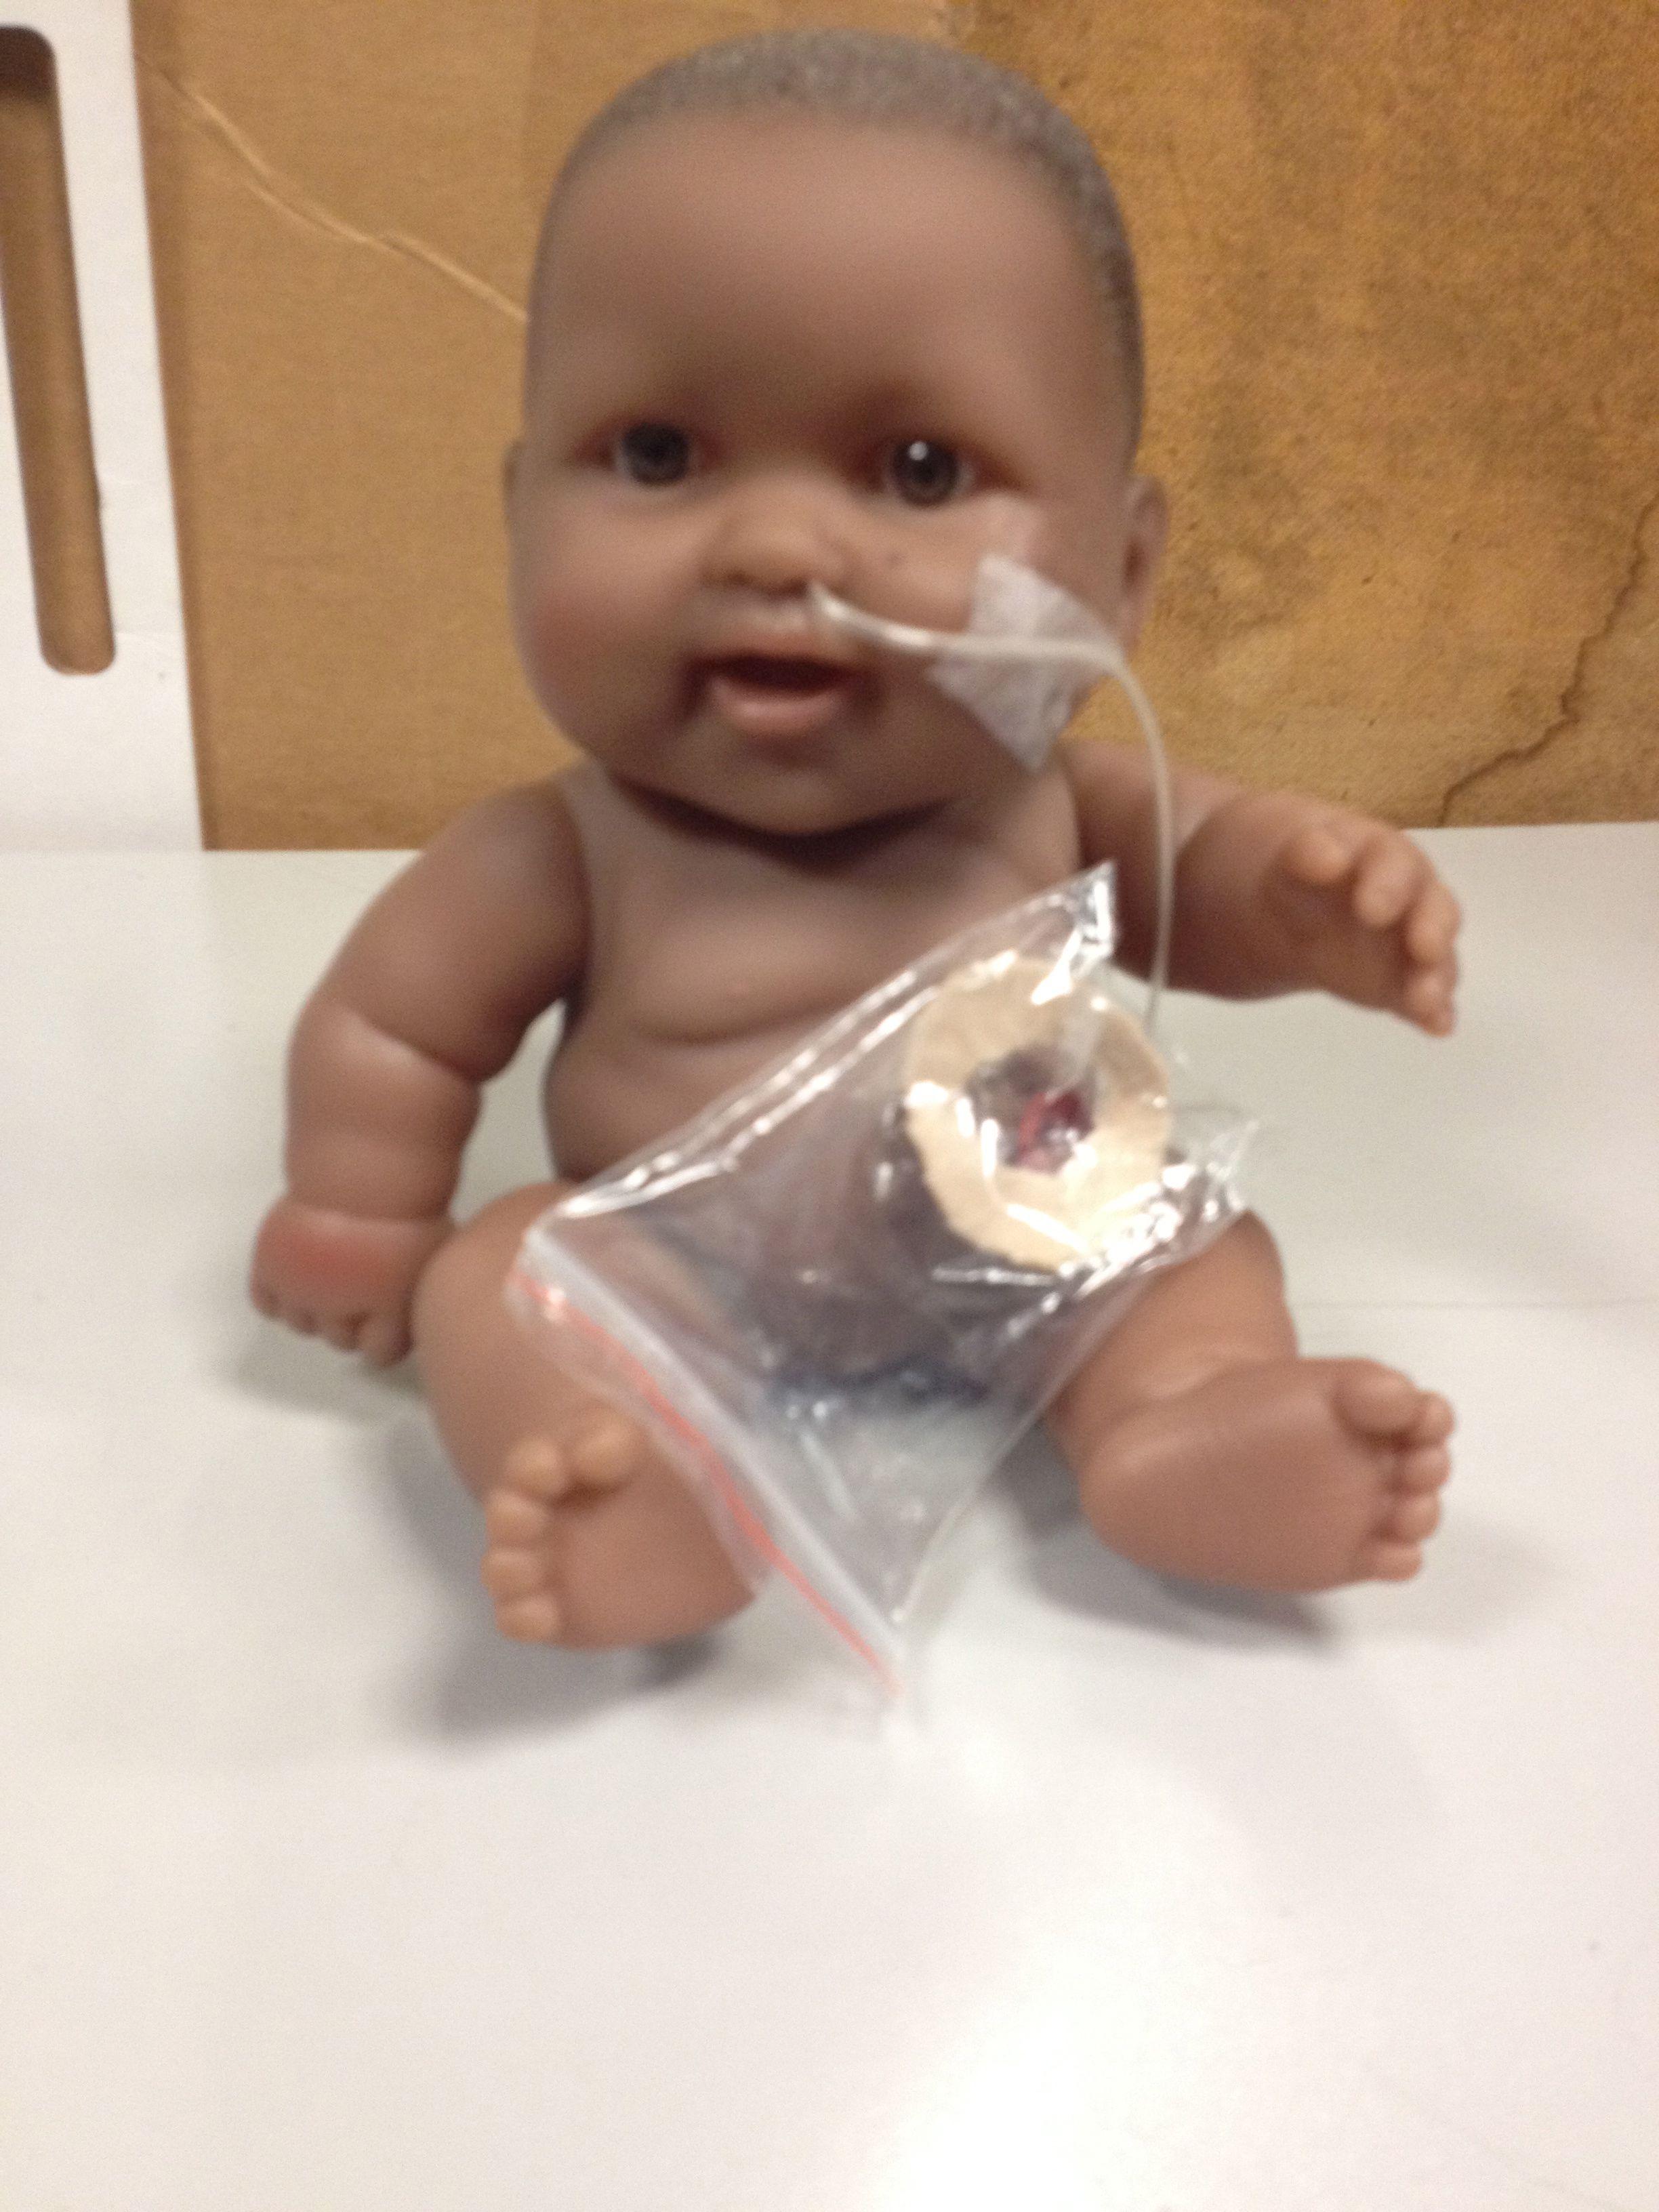 Medical Play Teaching Kids About A Ng And Stoma Used Tubing Tape Ziplock Bag Balloon Moleskin Looseparts Childlife